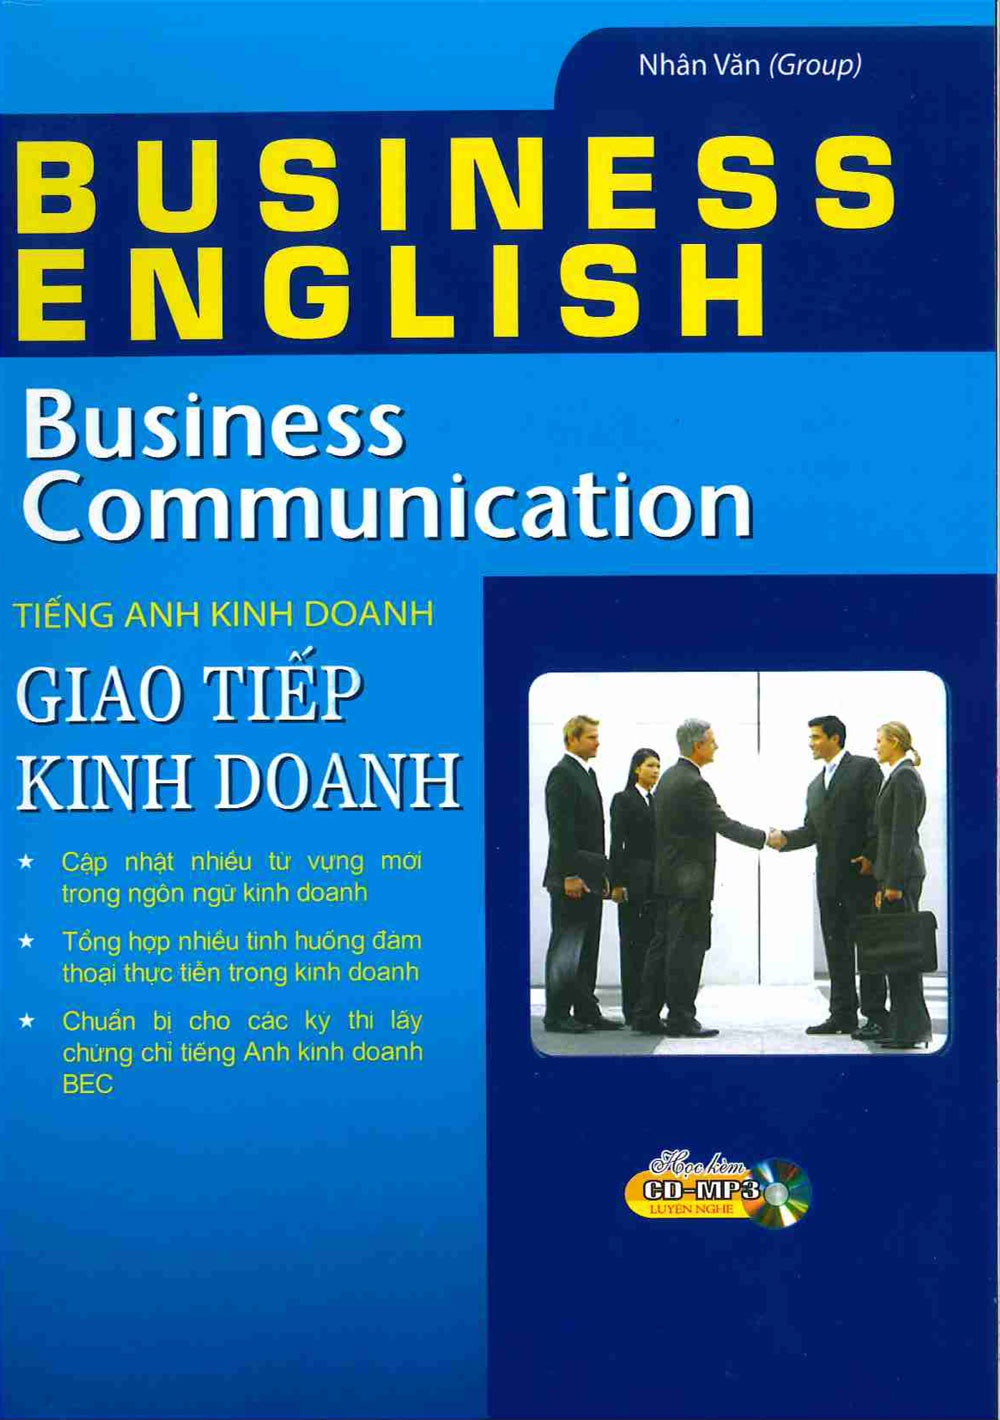 Tiếng Anh Kinh Doanh – Giao Tiếp Kinh Doanh (Kèm CD)